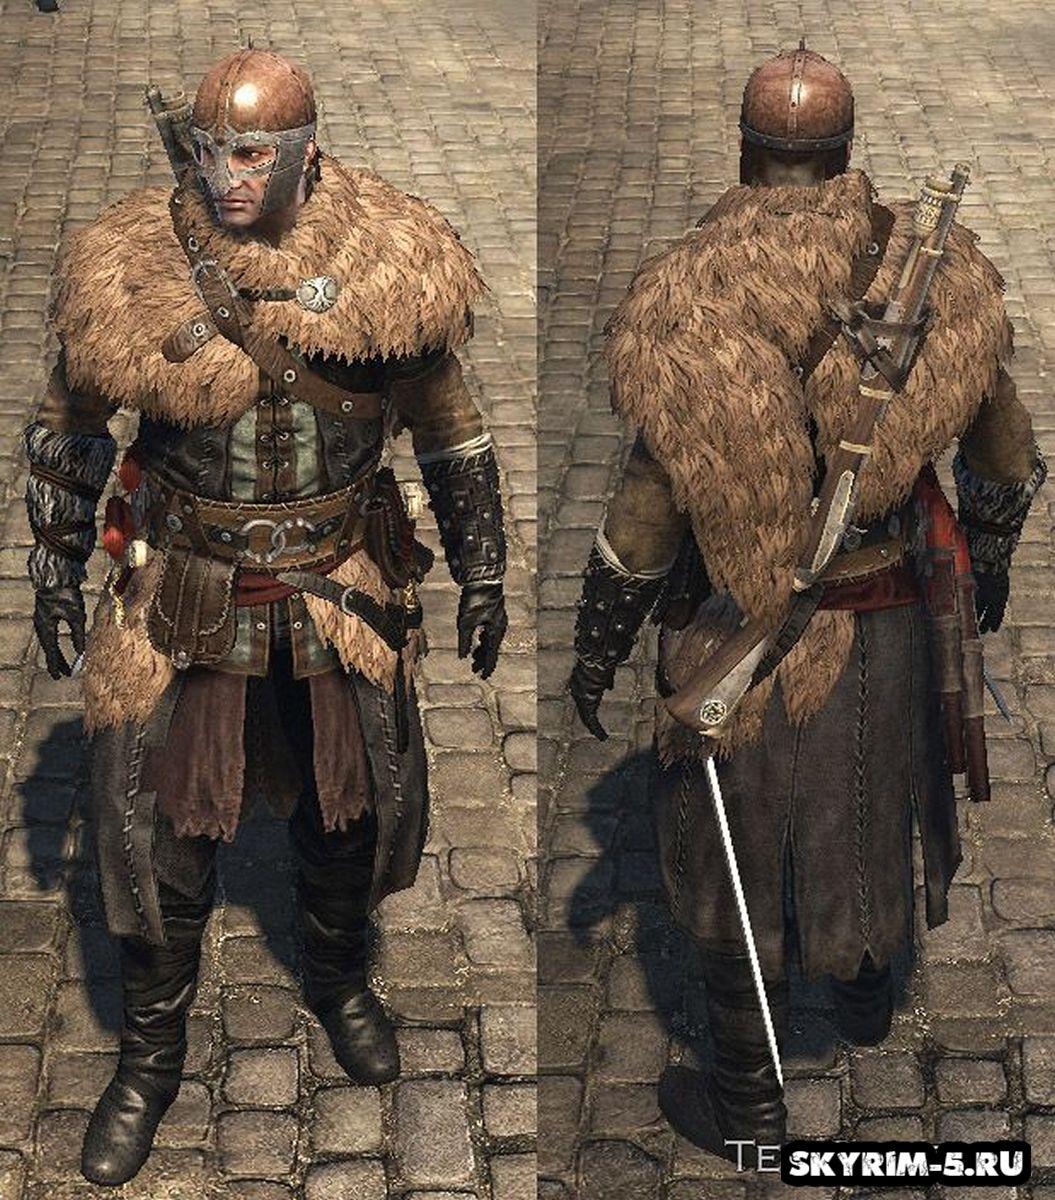 Броня викинга - Assassin's Creed RogueМоды Скайрим > Броня и одежда Скайрим